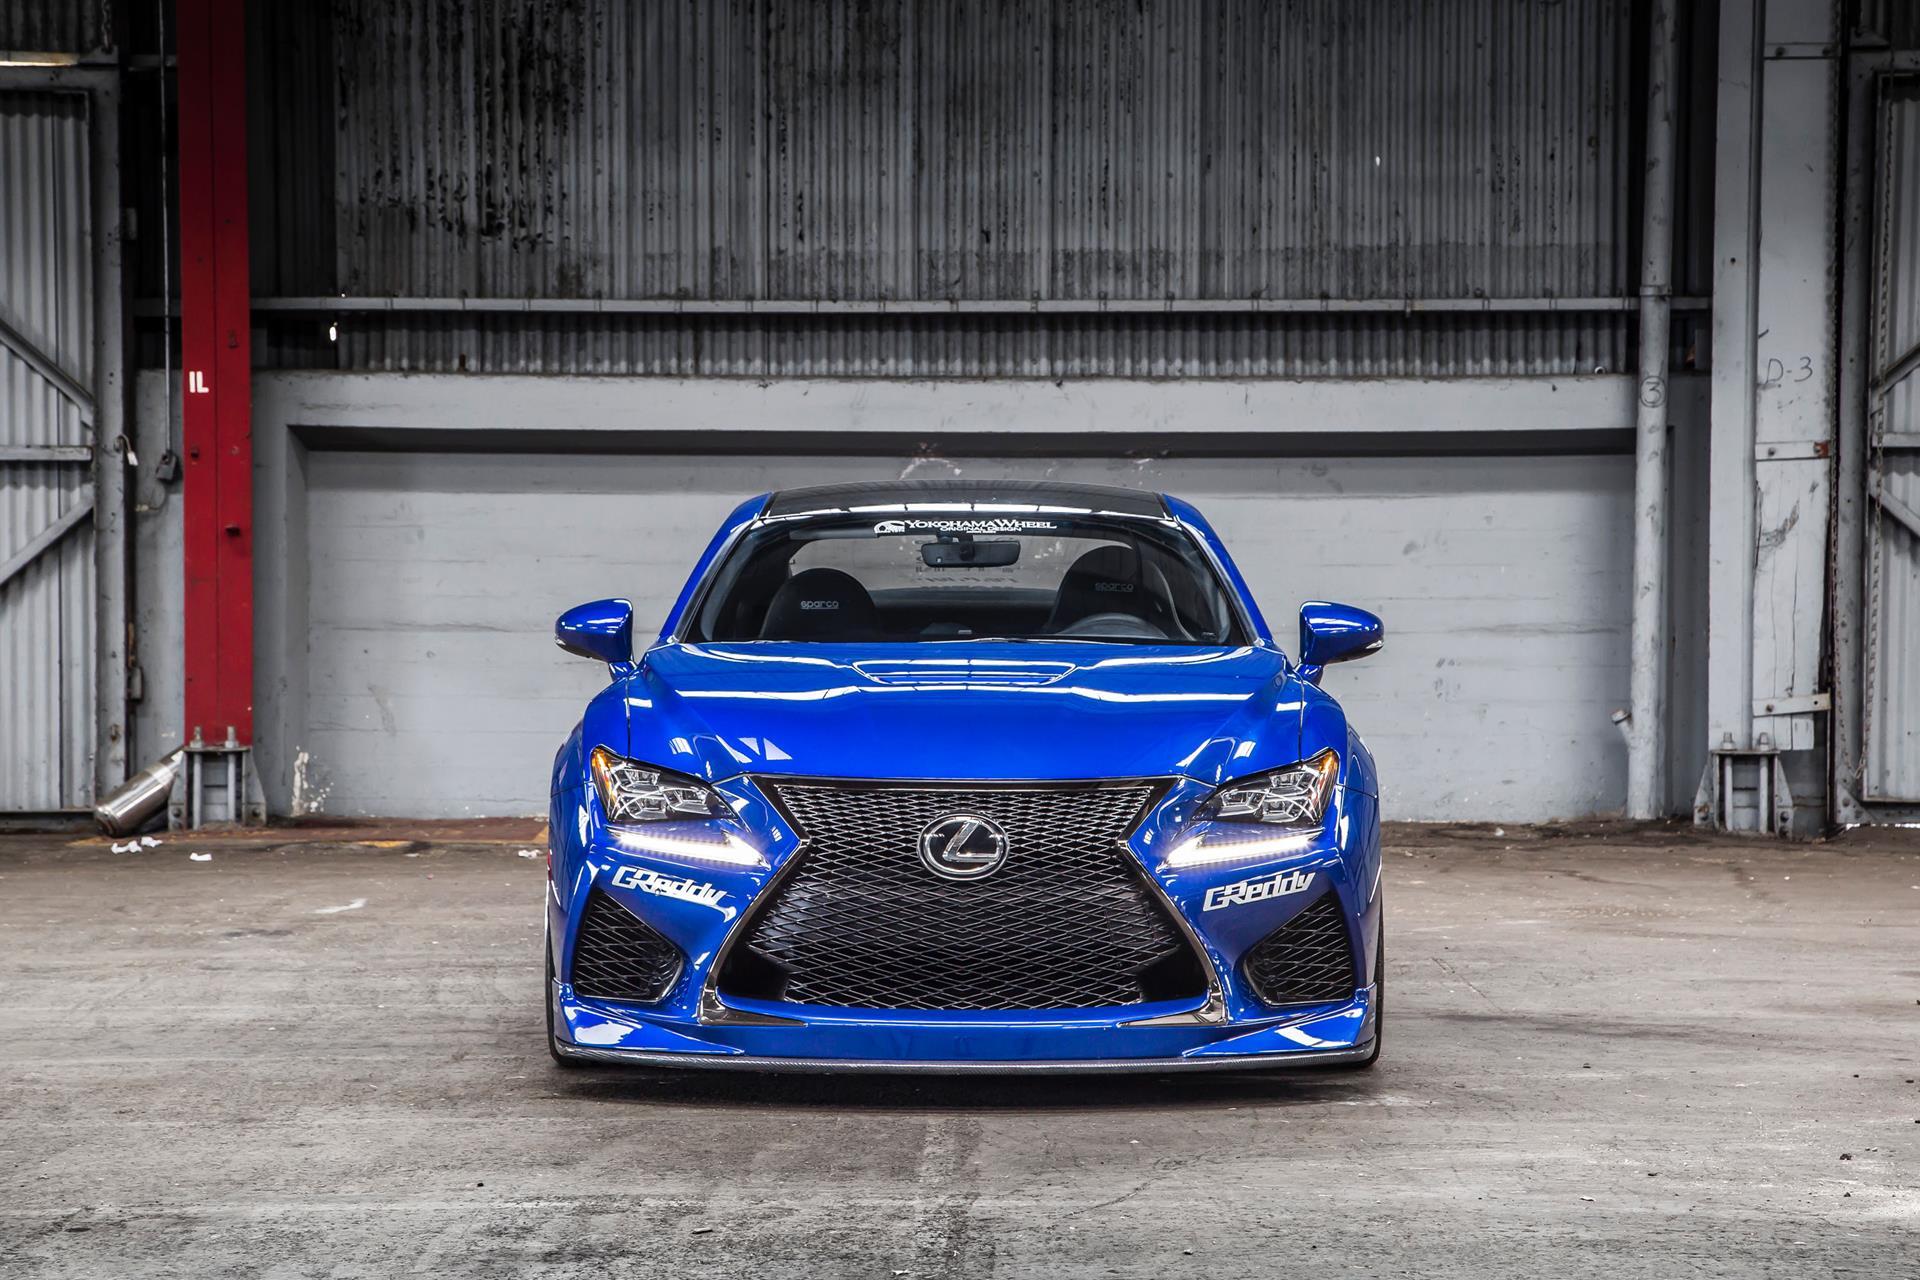 2015 Lexus RC F Gordon Ting - conceptcarz.com